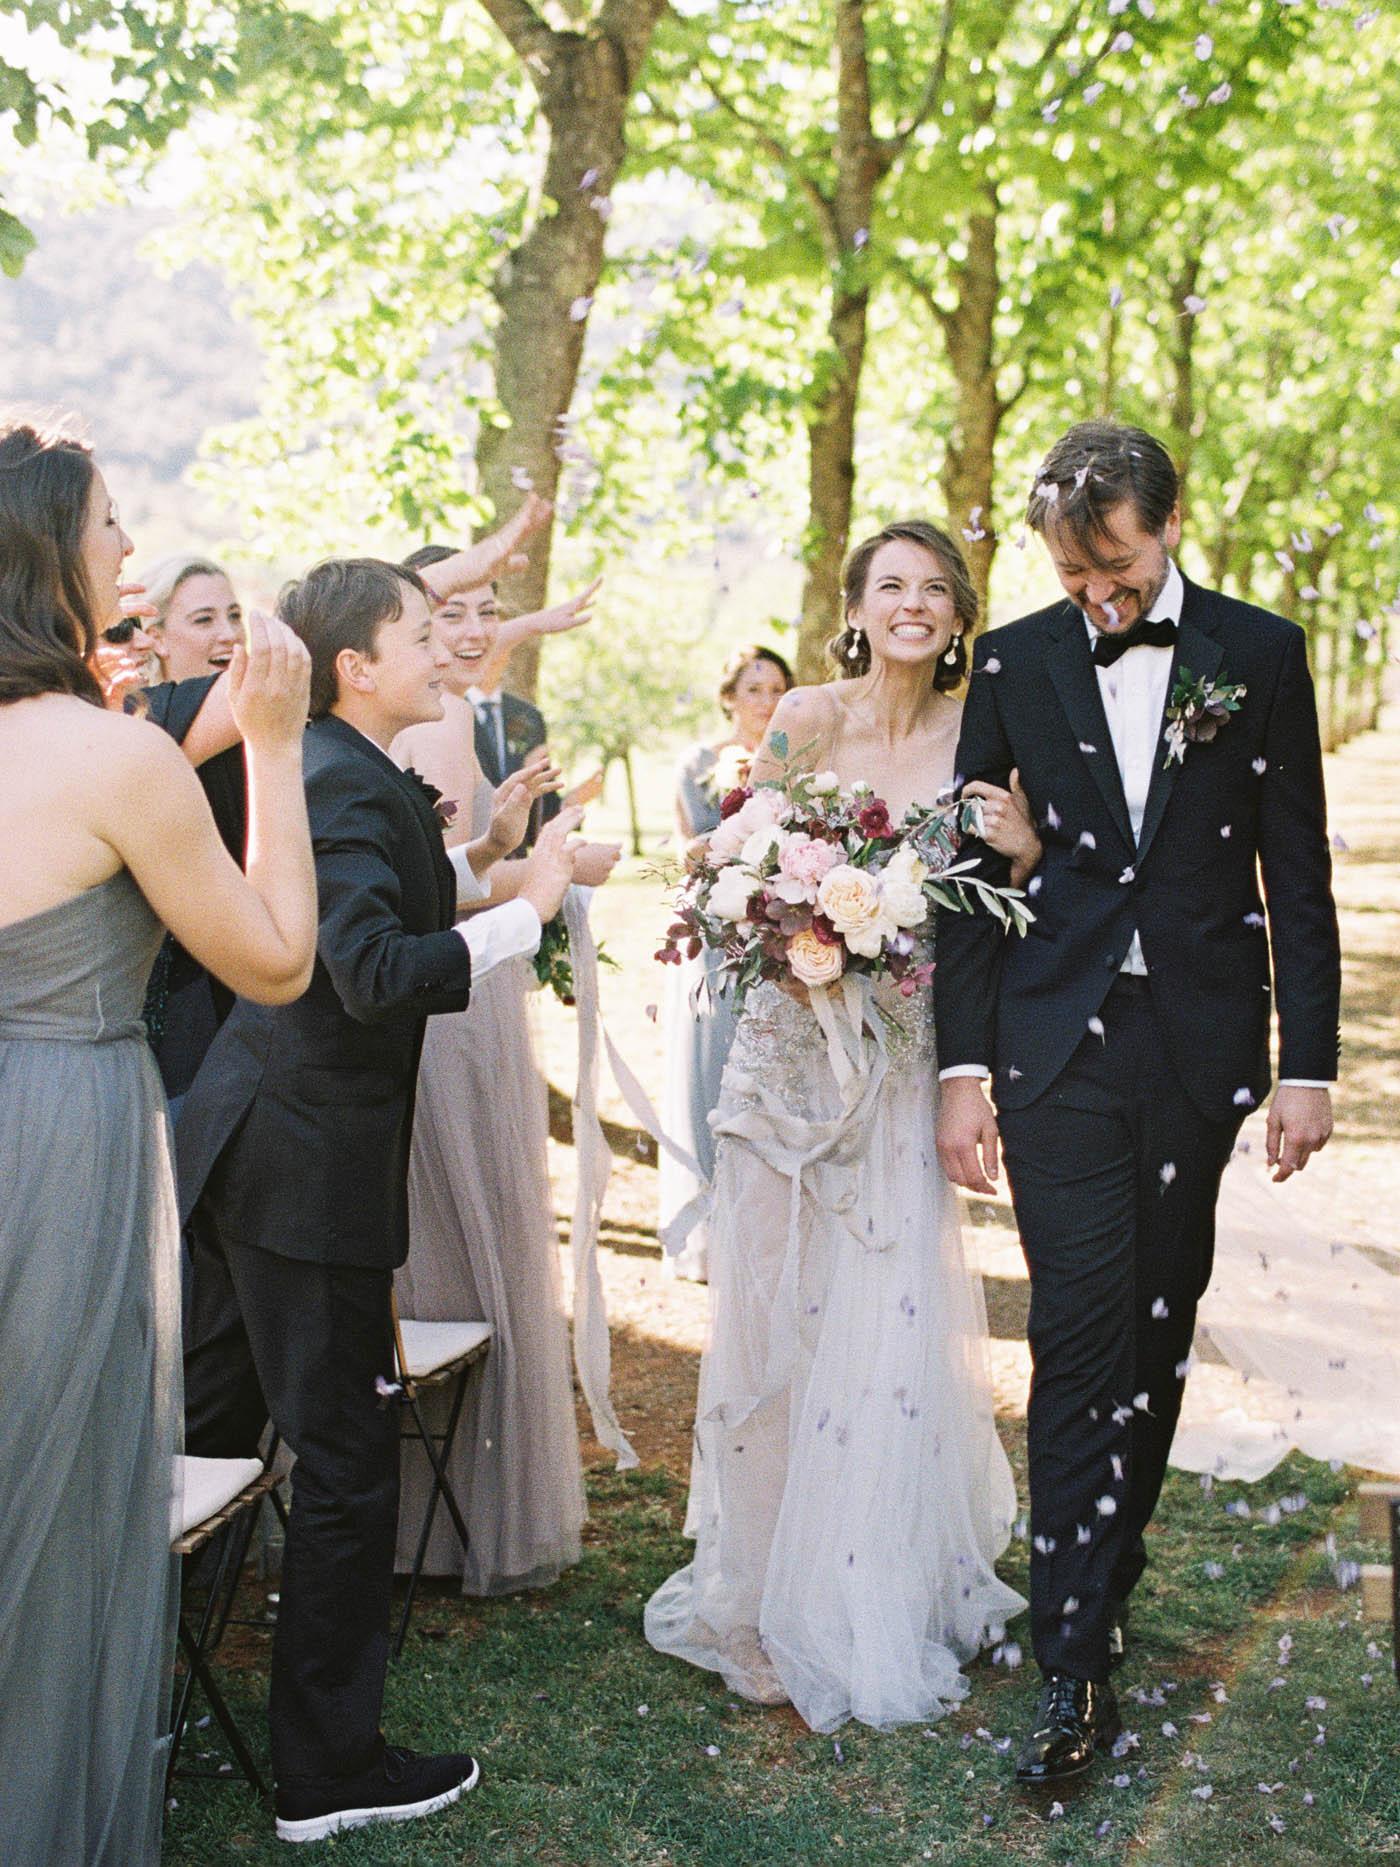 Villa_Cetinale_Wedding-33-Jen_Huang-ElanJacob-238-Jen_Huang-007297-R1-027.jpg